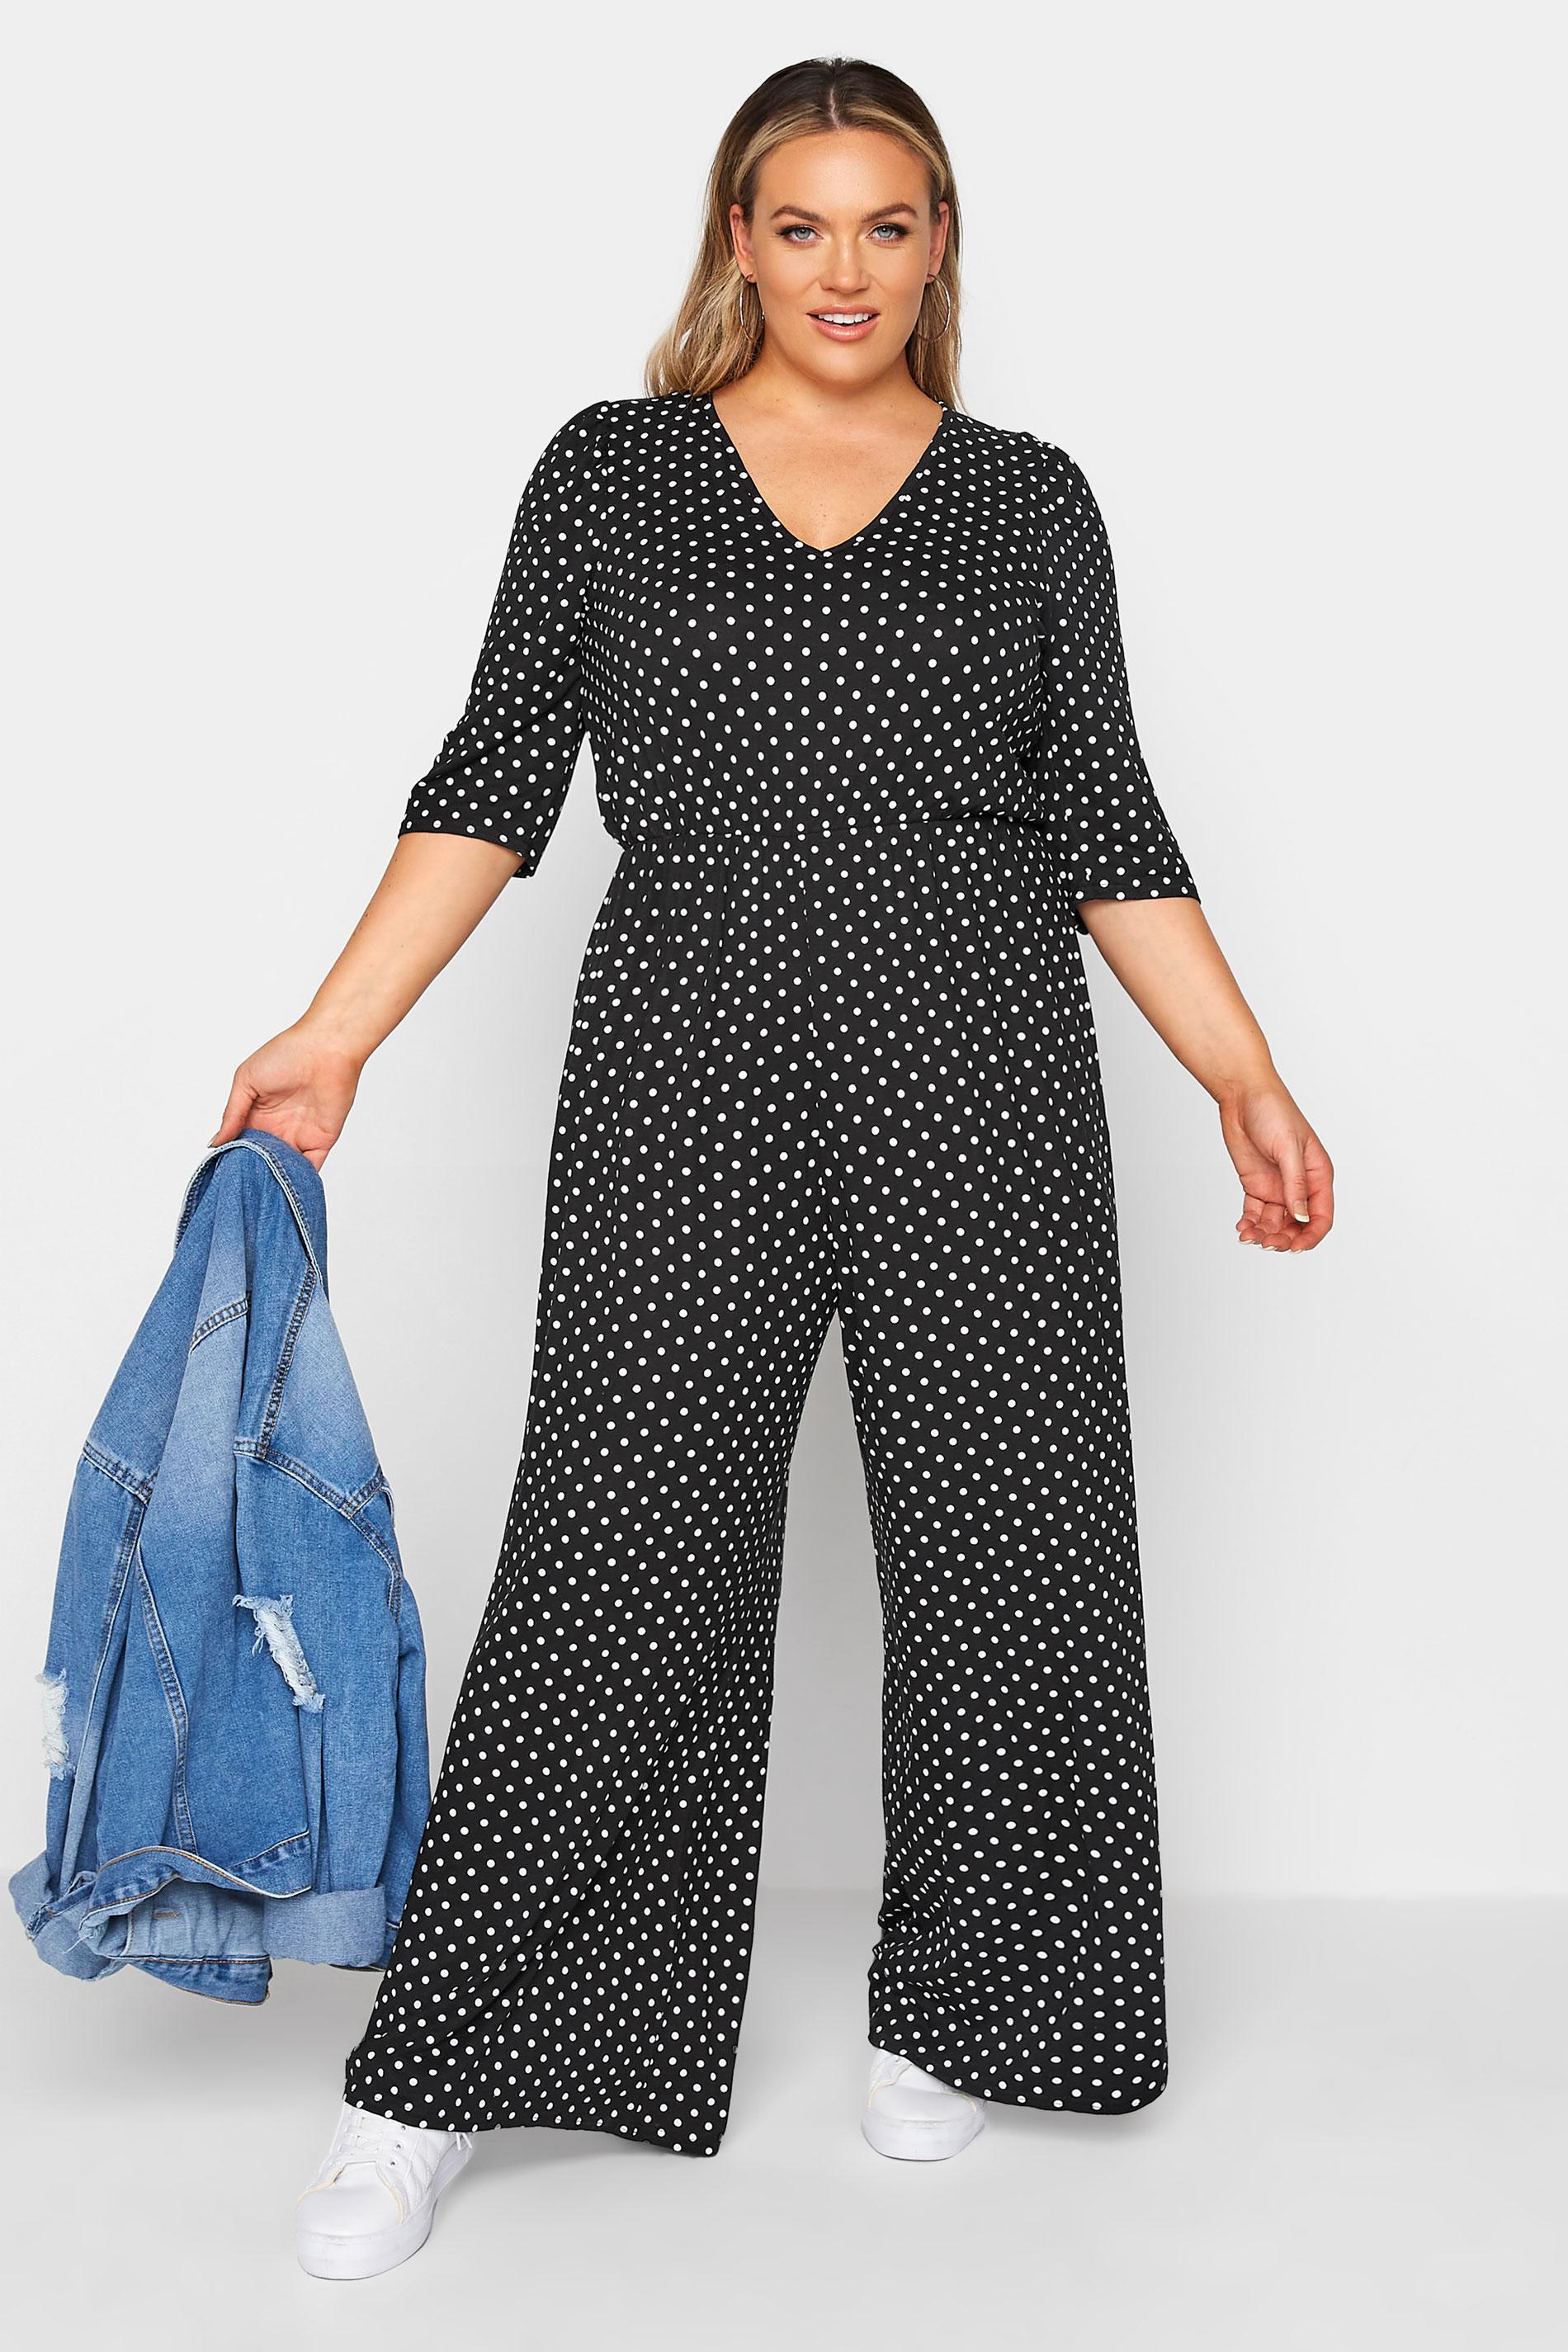 LIMITED COLLECTION Black Polka Dot Jumpsuit_A.jpg